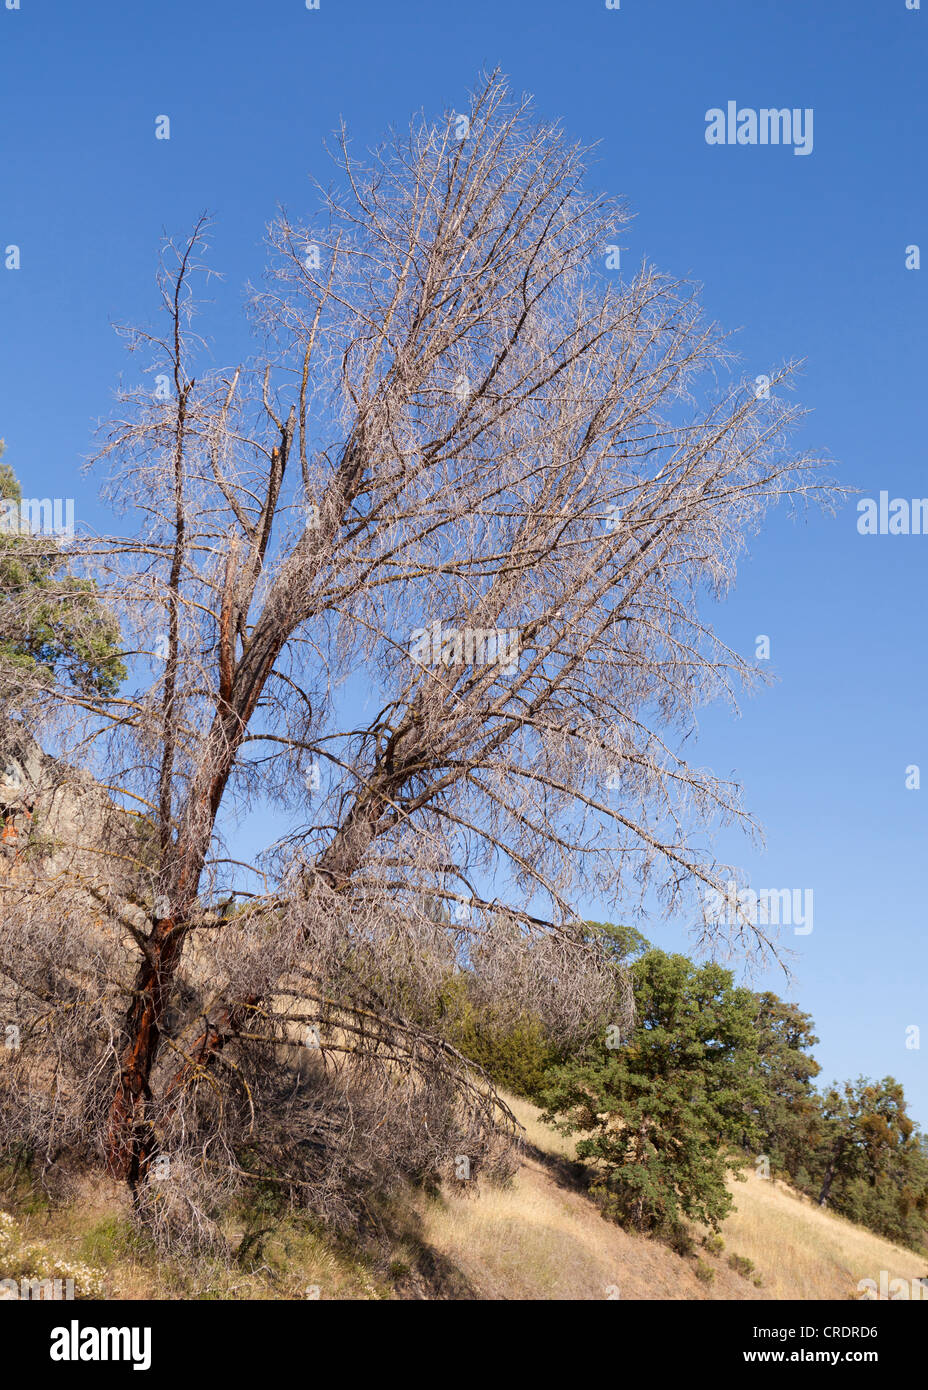 Dead tree on hillside - Stock Image